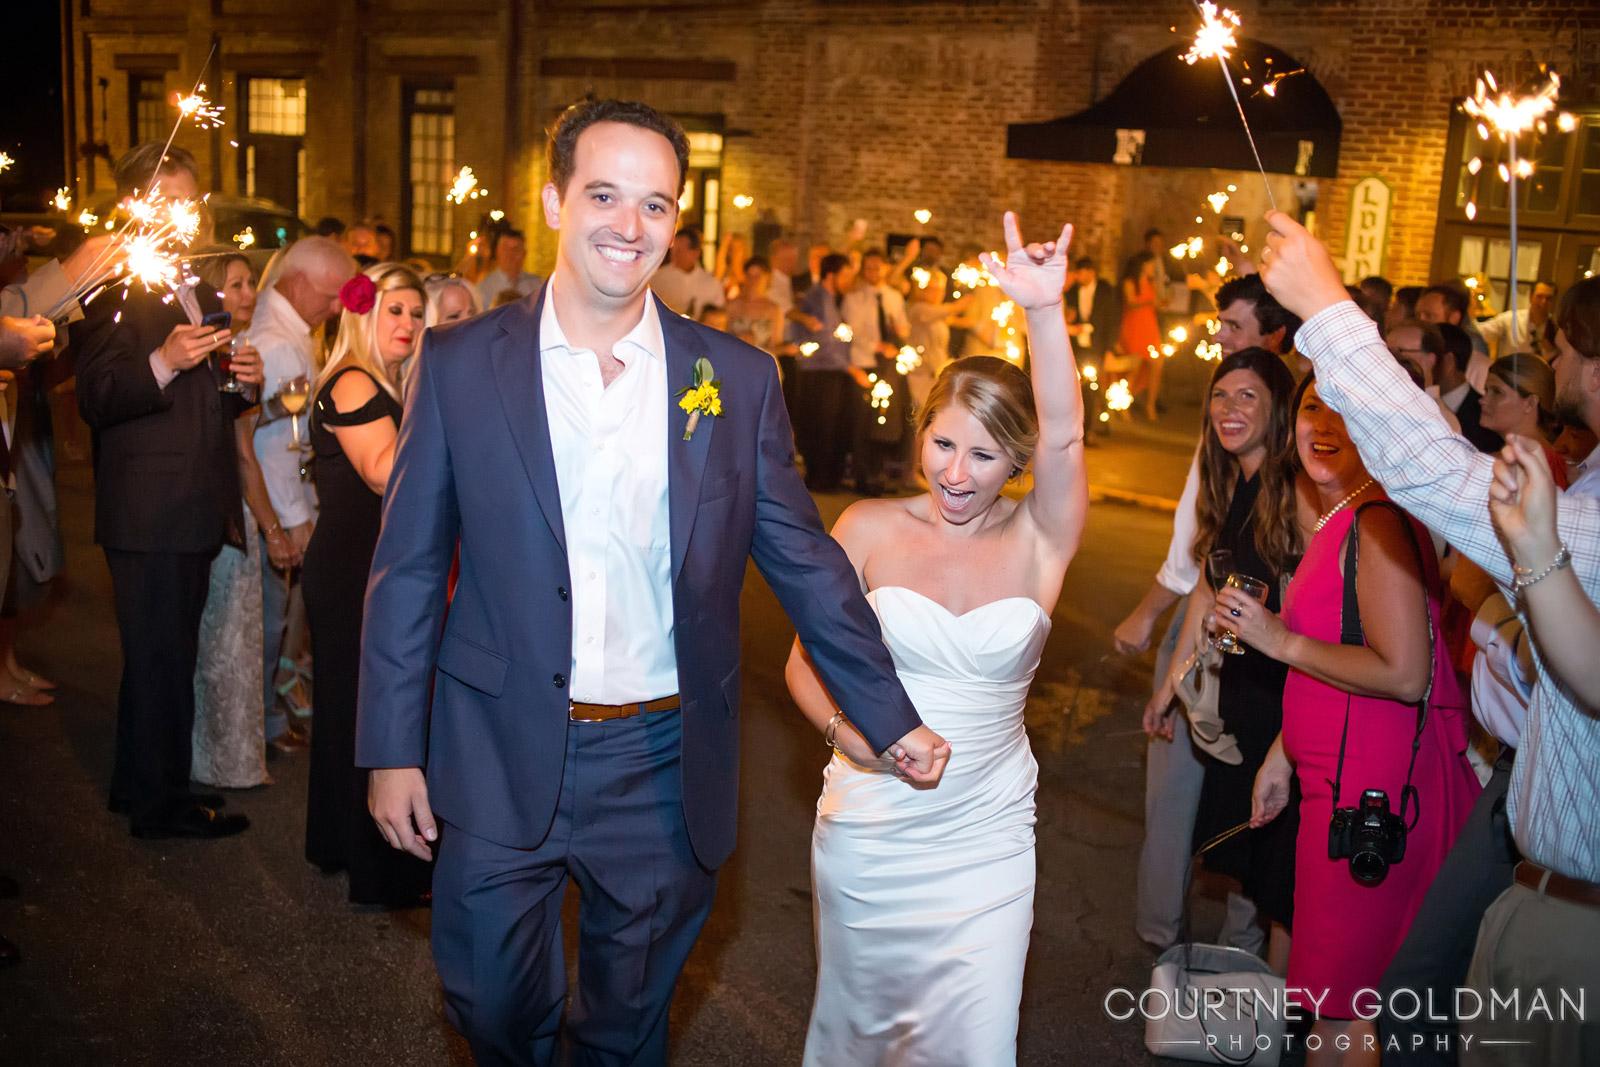 Atlanta-Wedding-Photography-by-Courtney-Goldman-63.jpg